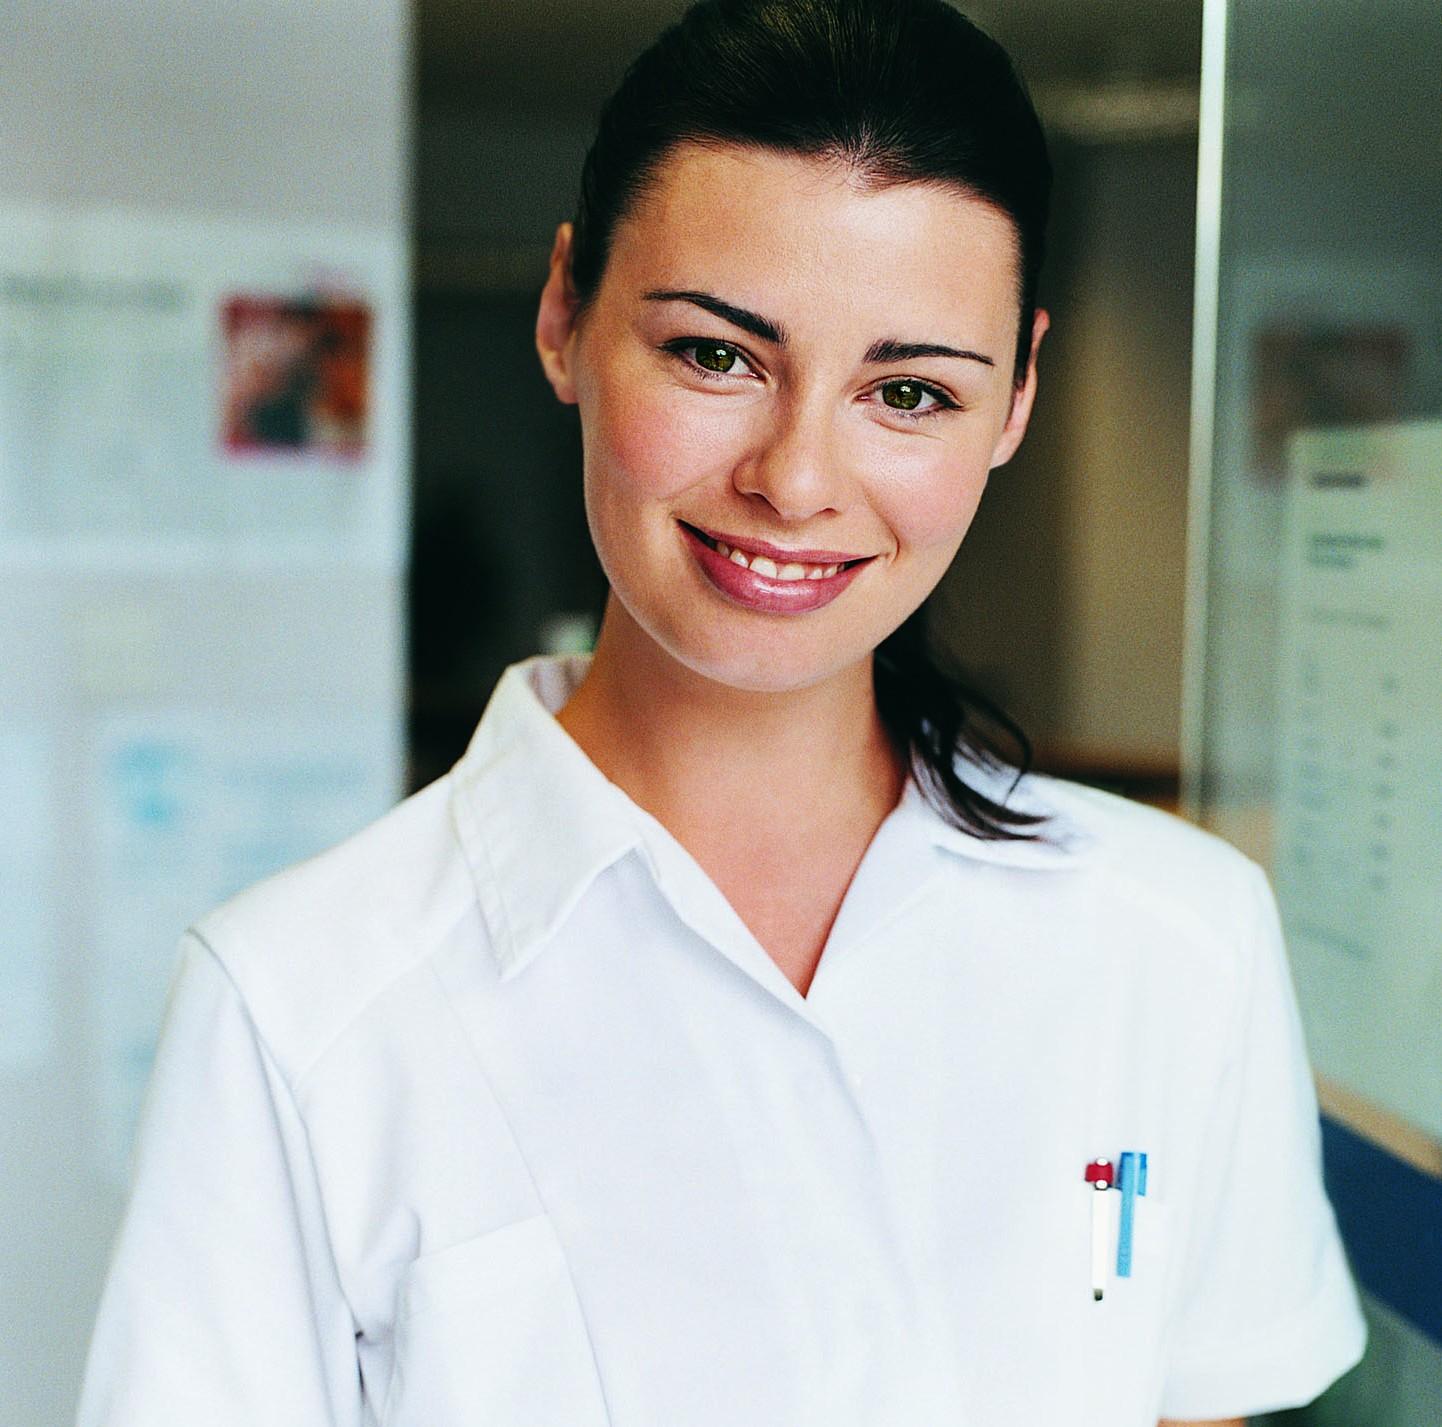 Cabinet medical metzervisse - Cabinet de recrutement medical ...